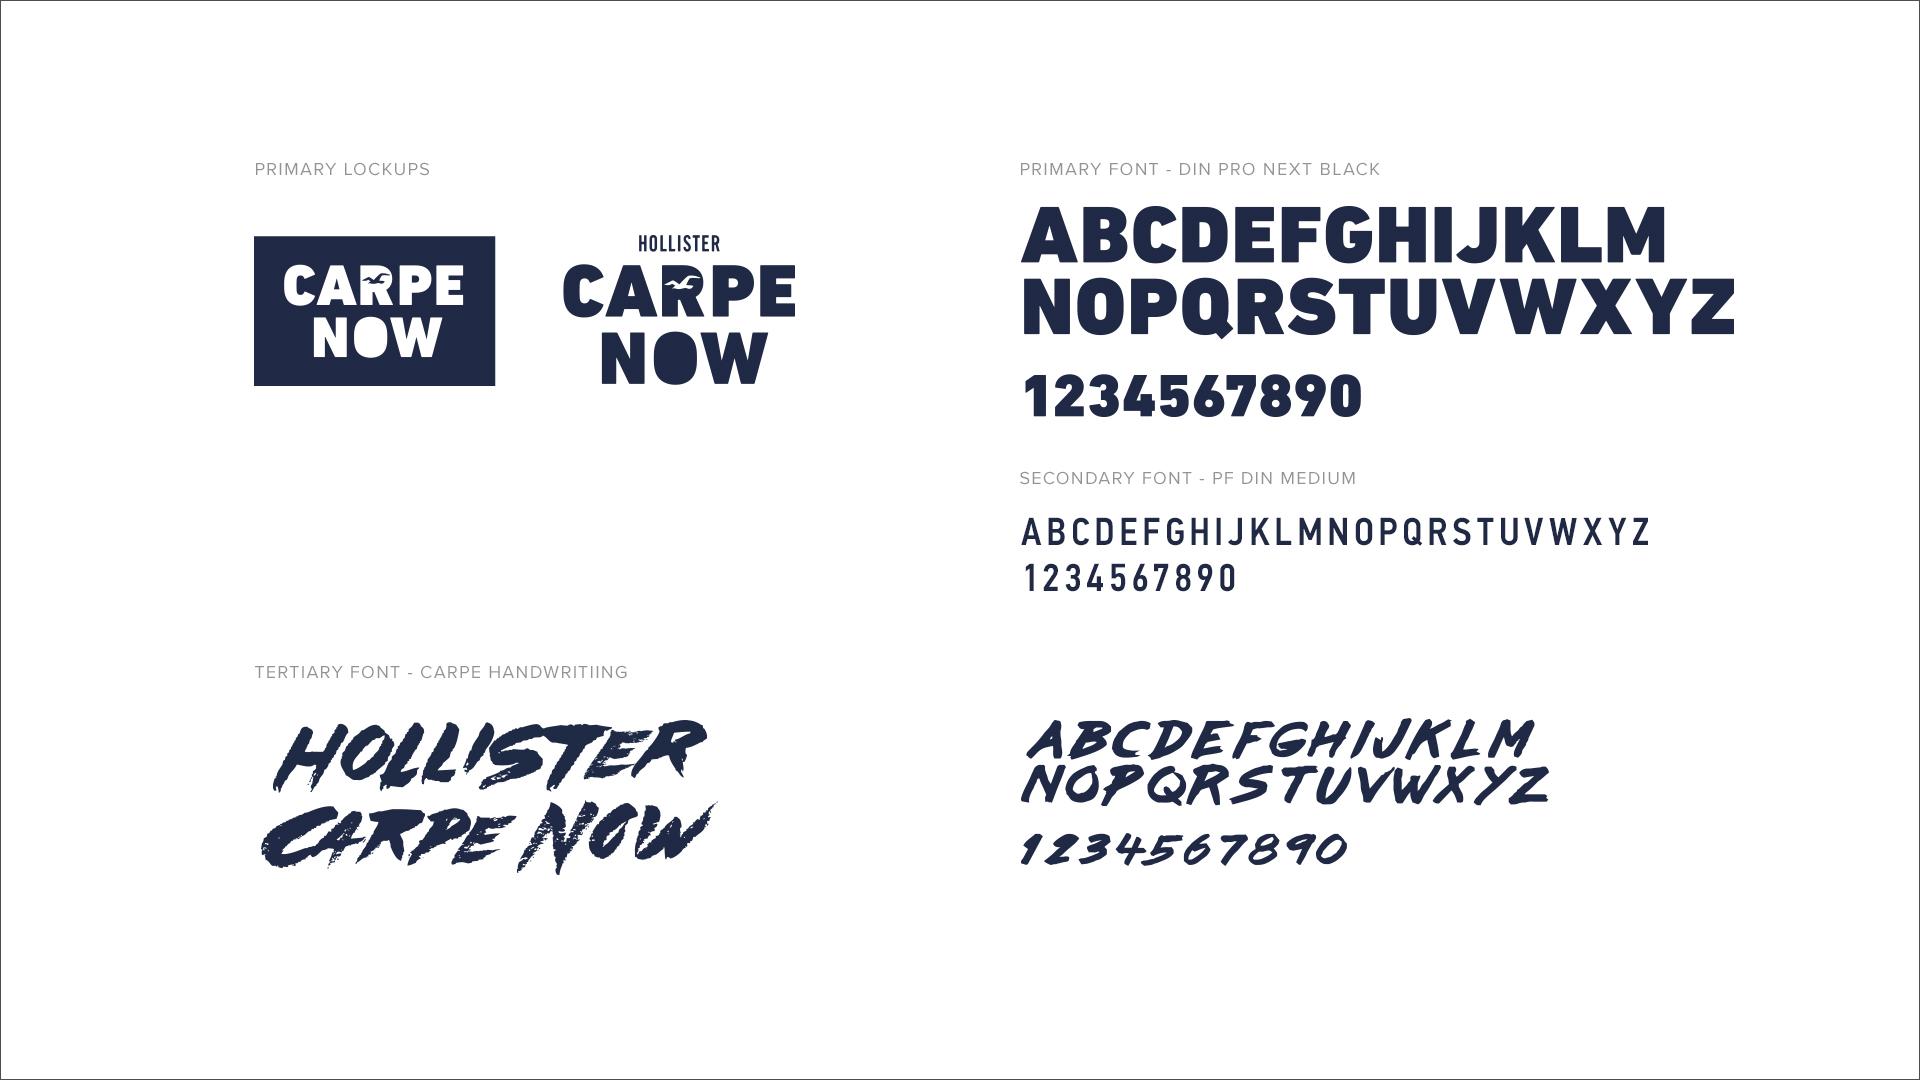 HCO_CARPE_TYPE_STYLE